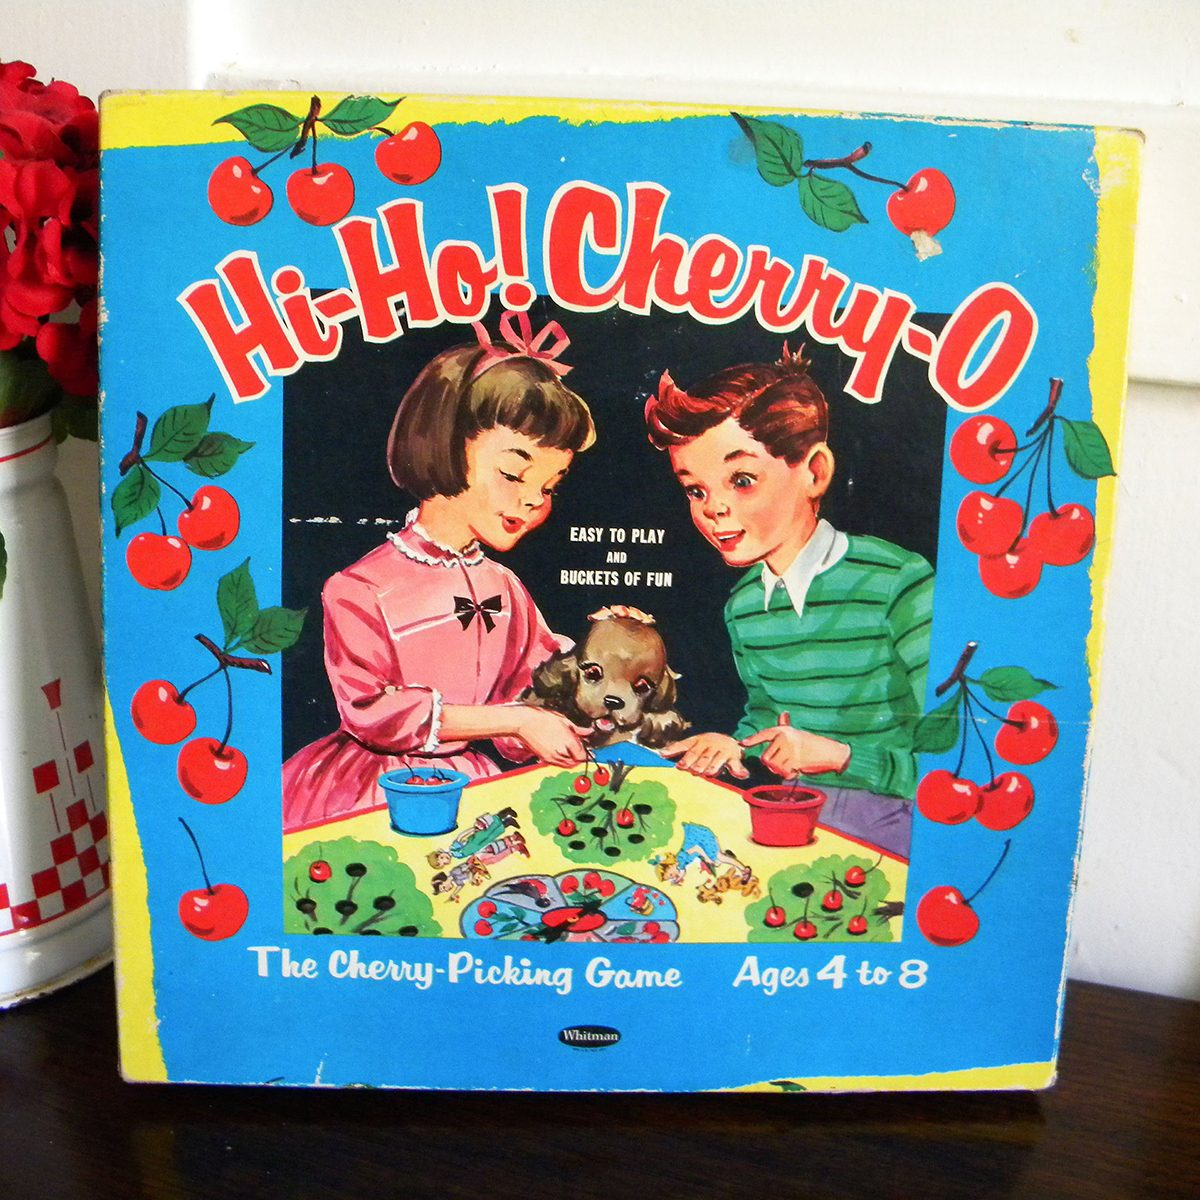 Vintage 1960 Hi Ho Cherry-O Game Whitman Childrens Classic Board Game Hi Ho Cherry O